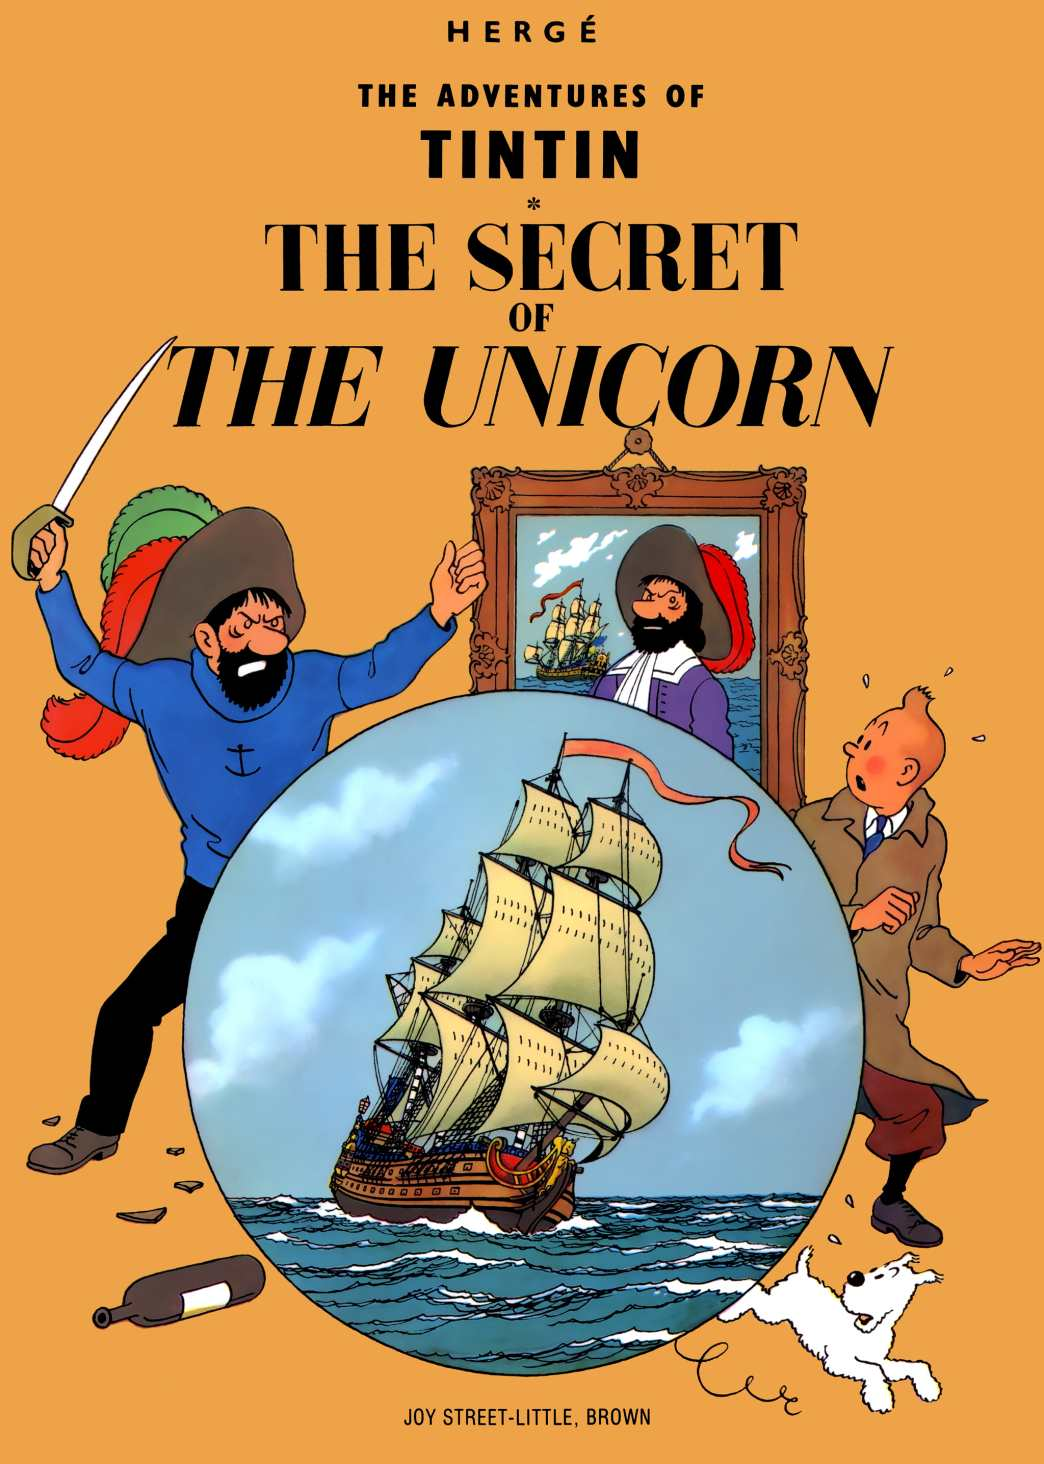 read-tintin-comics-online-free-pdf-download-001 | TimeSpace Warps